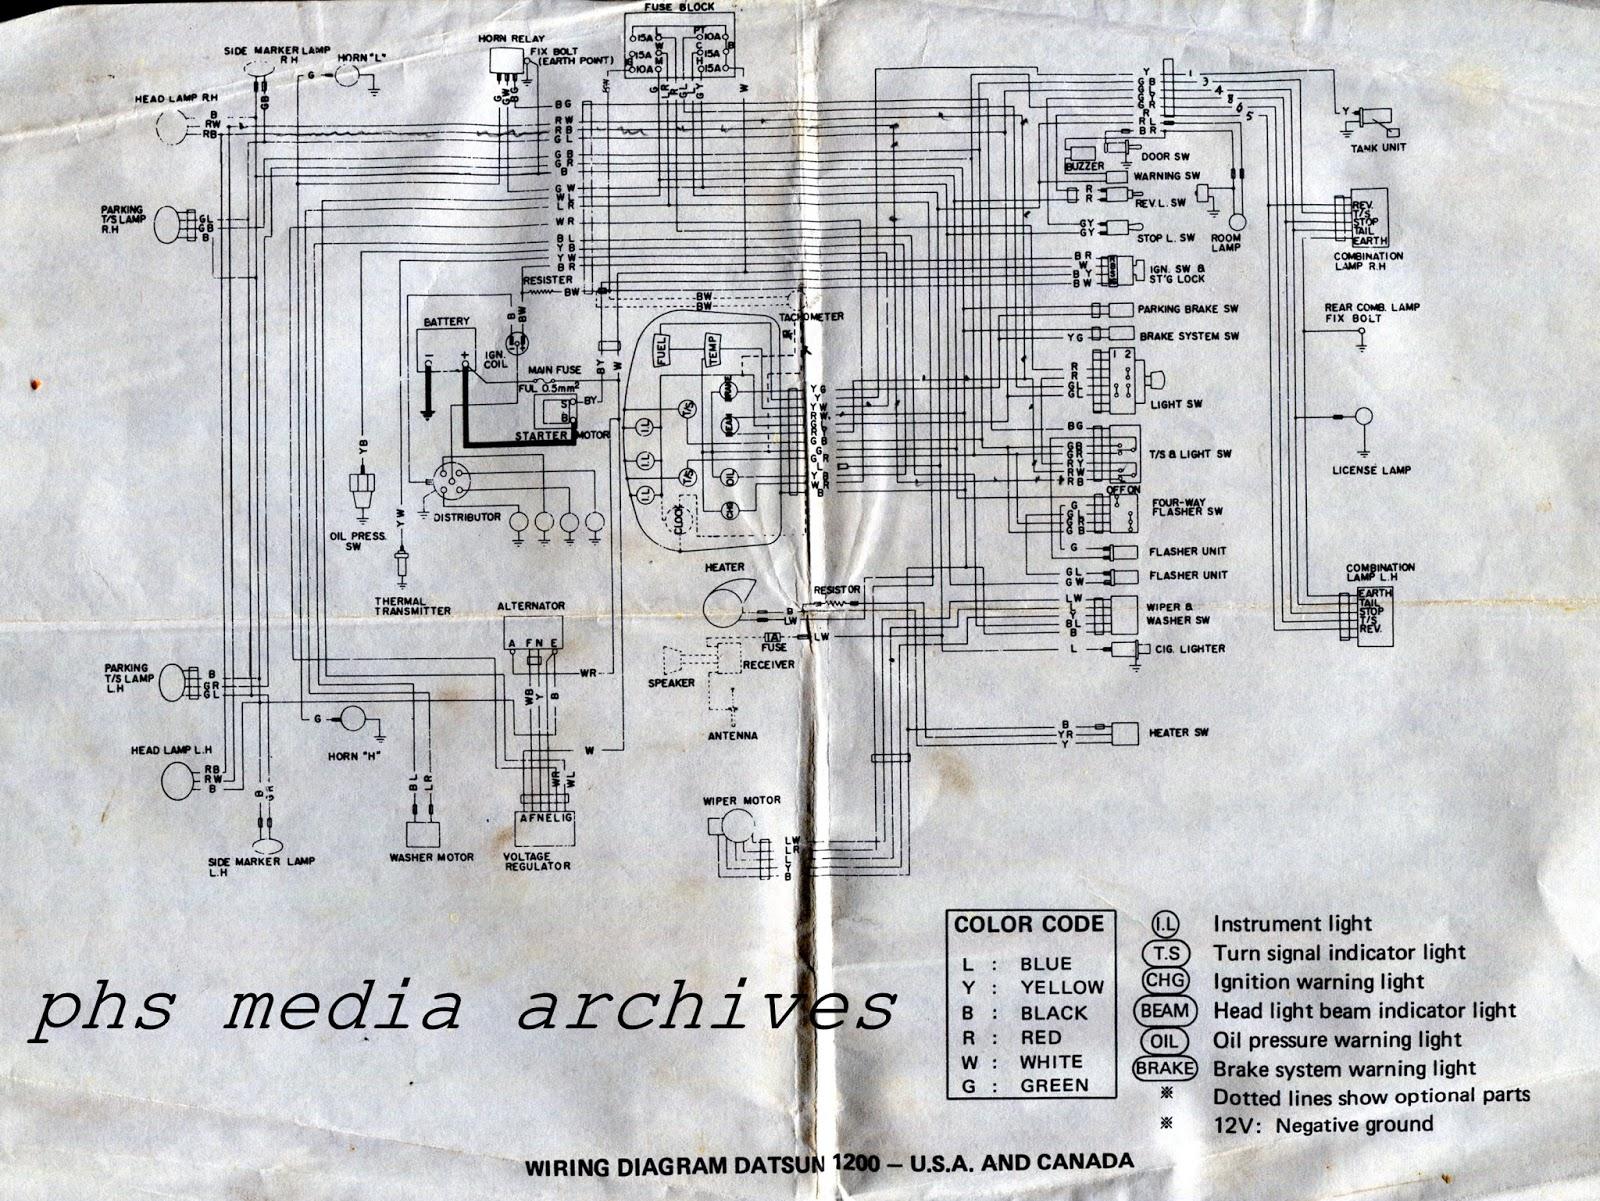 free download wiring diagram: Phs Tech Series 1971 72 Datsun 1200 Wiring Diagrams of La